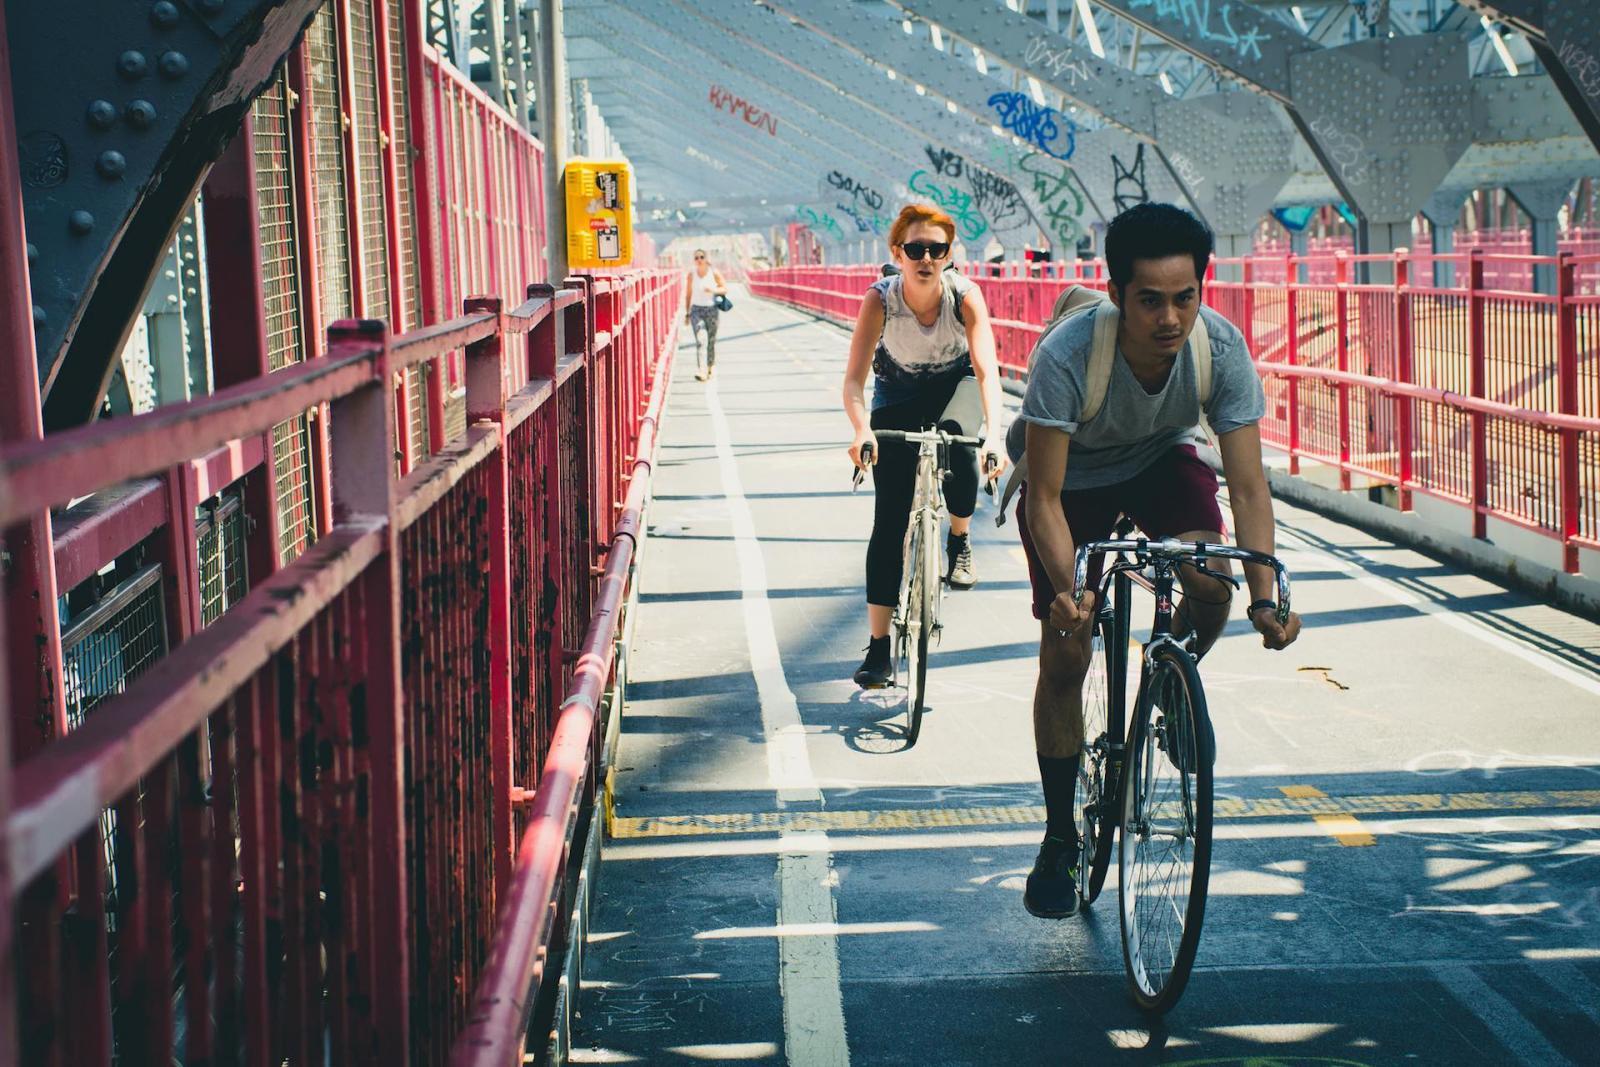 Heute: Fahrradtour in New York + Tipps zum Fahrradverleih